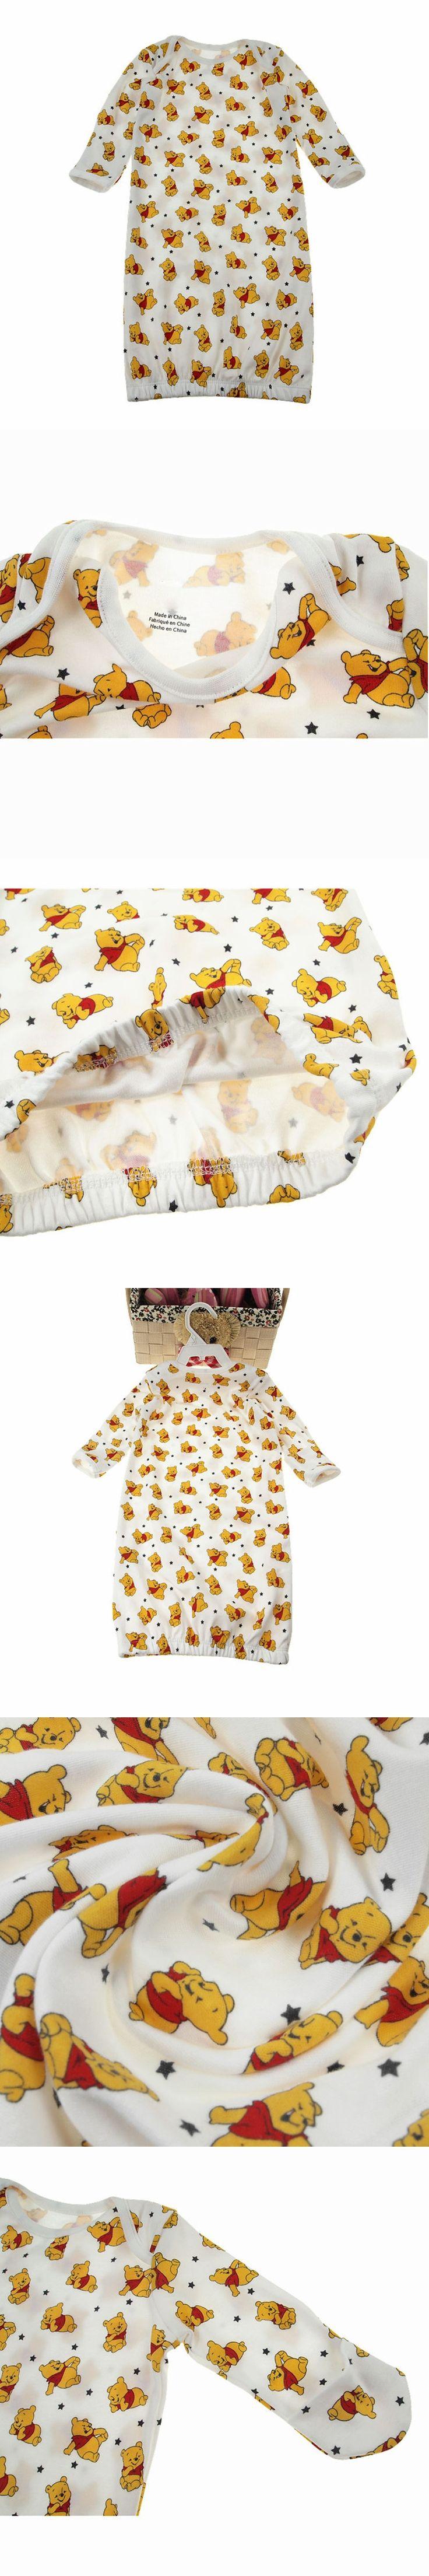 Newborn Lovely Baby Boy Girl Sleepwear & Robe Sleeping Bags Pajama Infant Envelope Design Sleepsack Baby schlafsack Prevent Kick